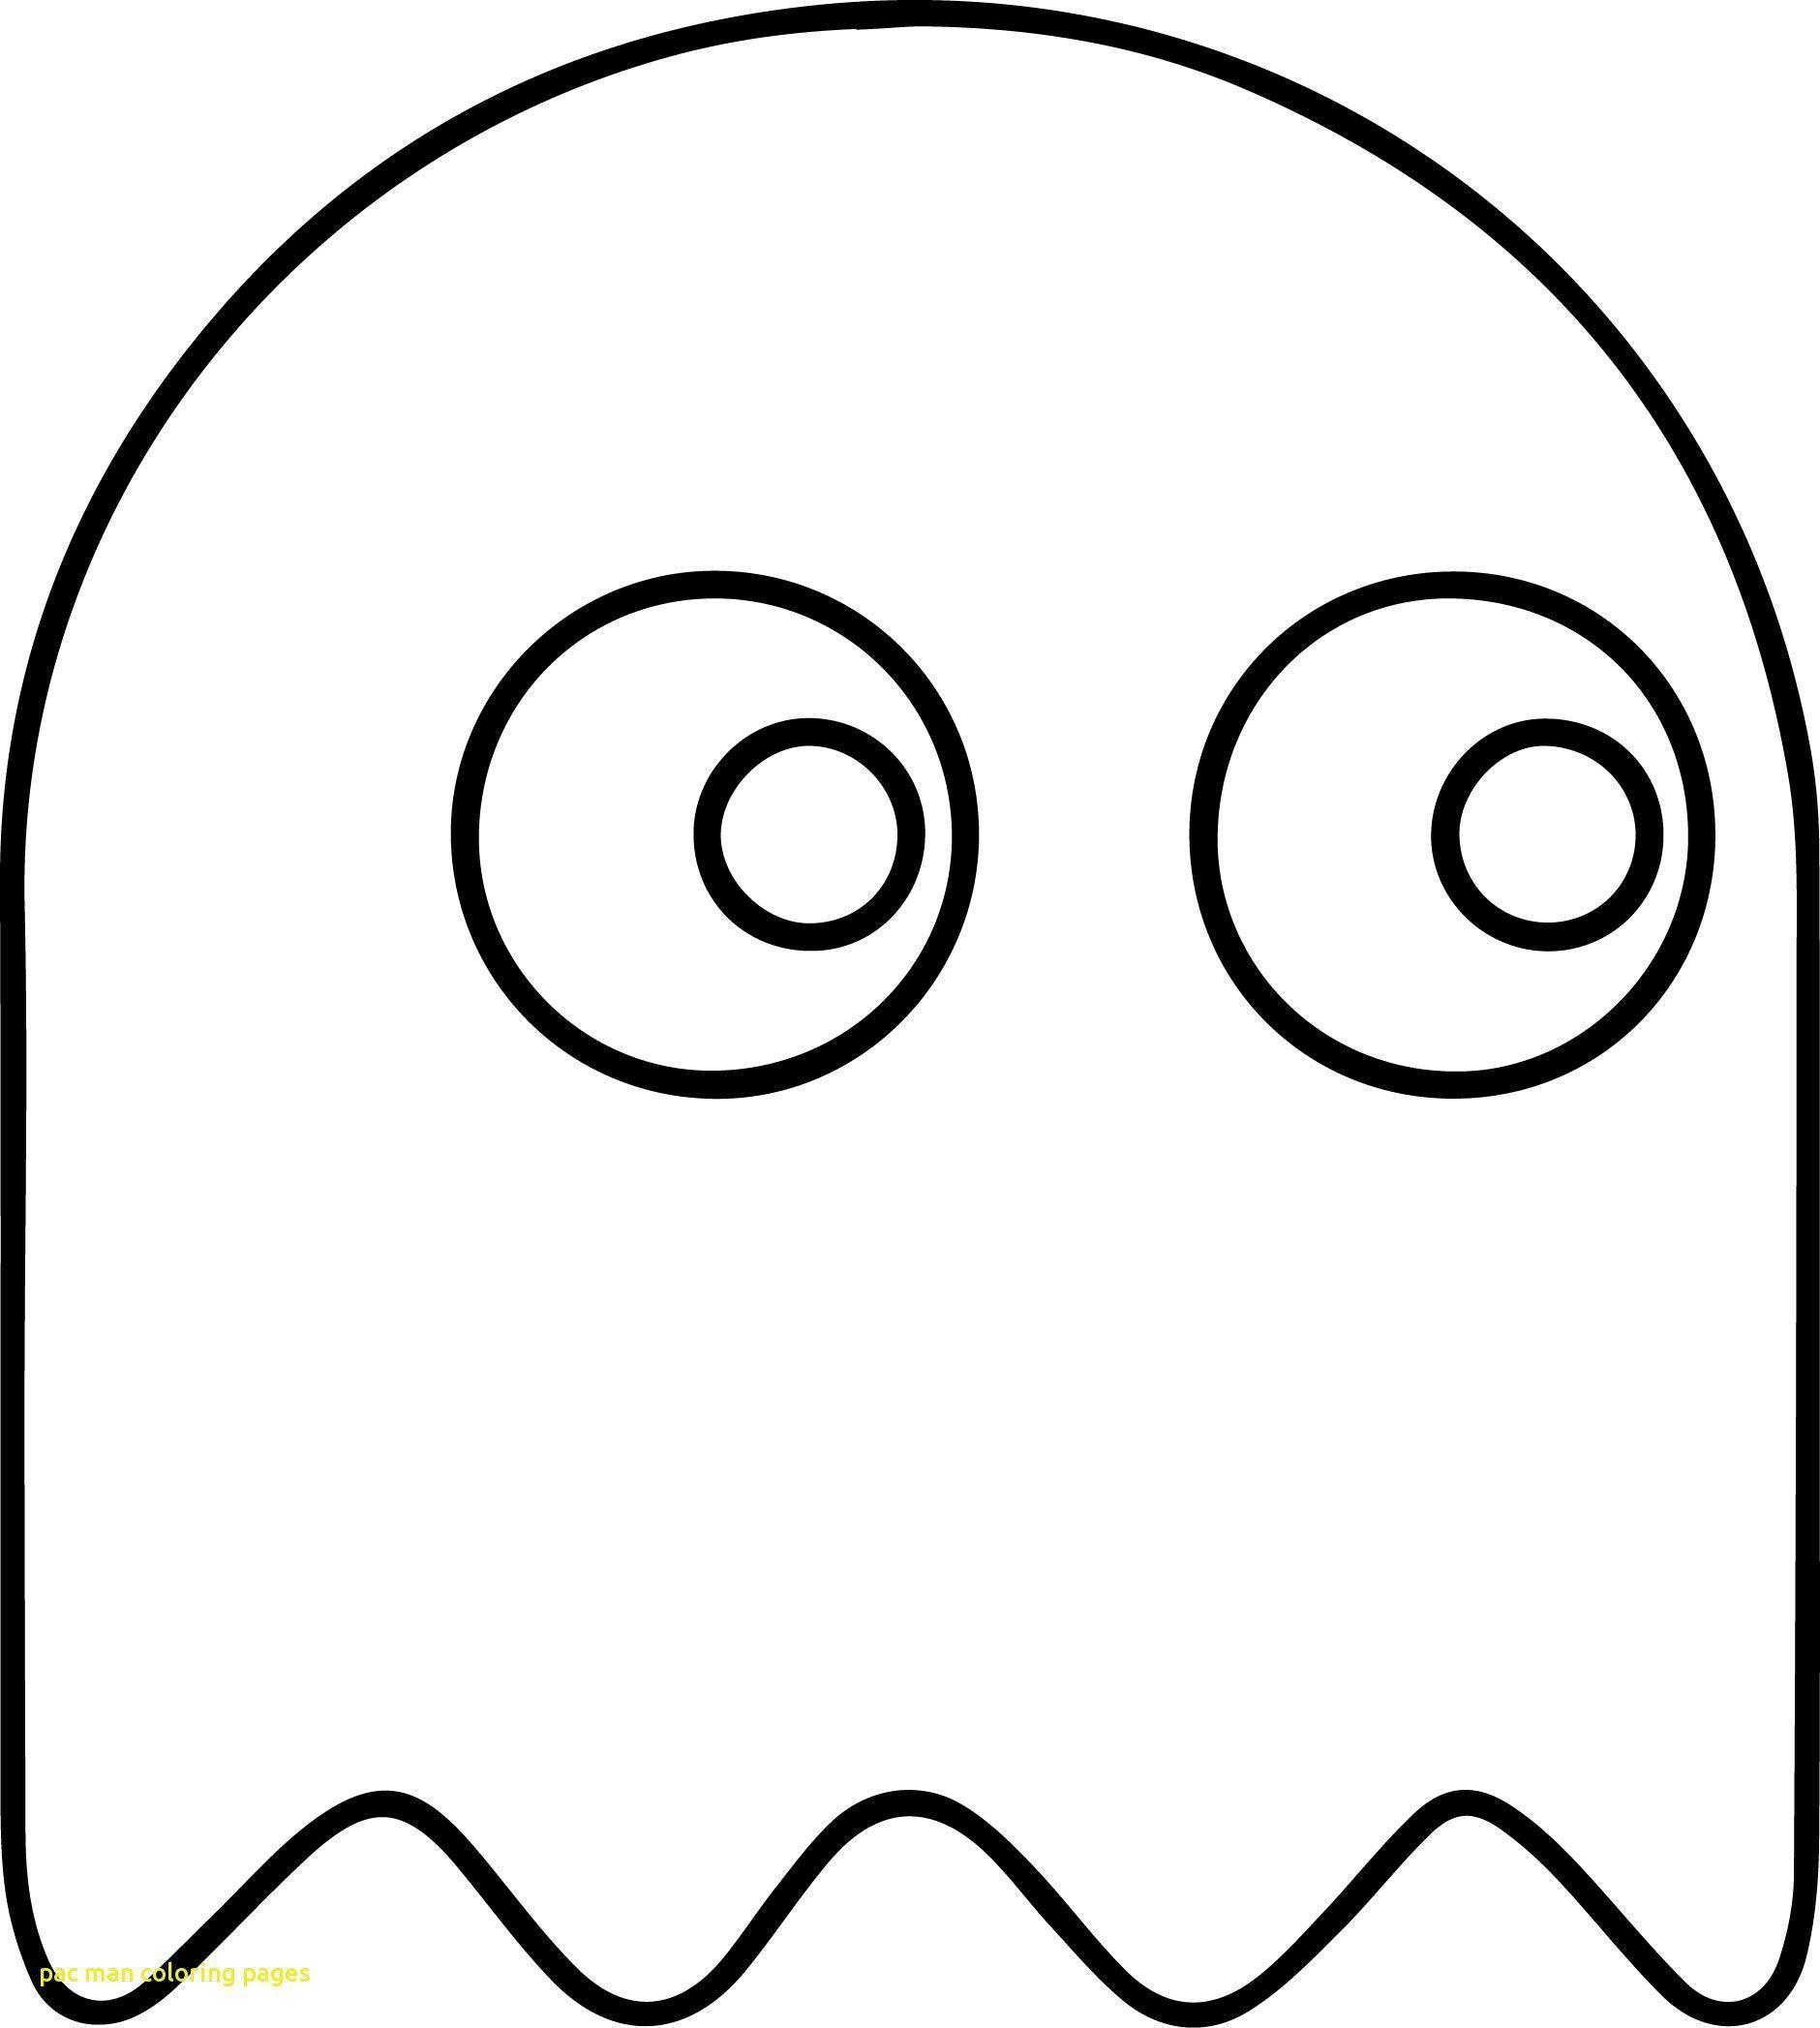 Coloring pages Pacman Ghost en 2020   Dibujos de halloween ...